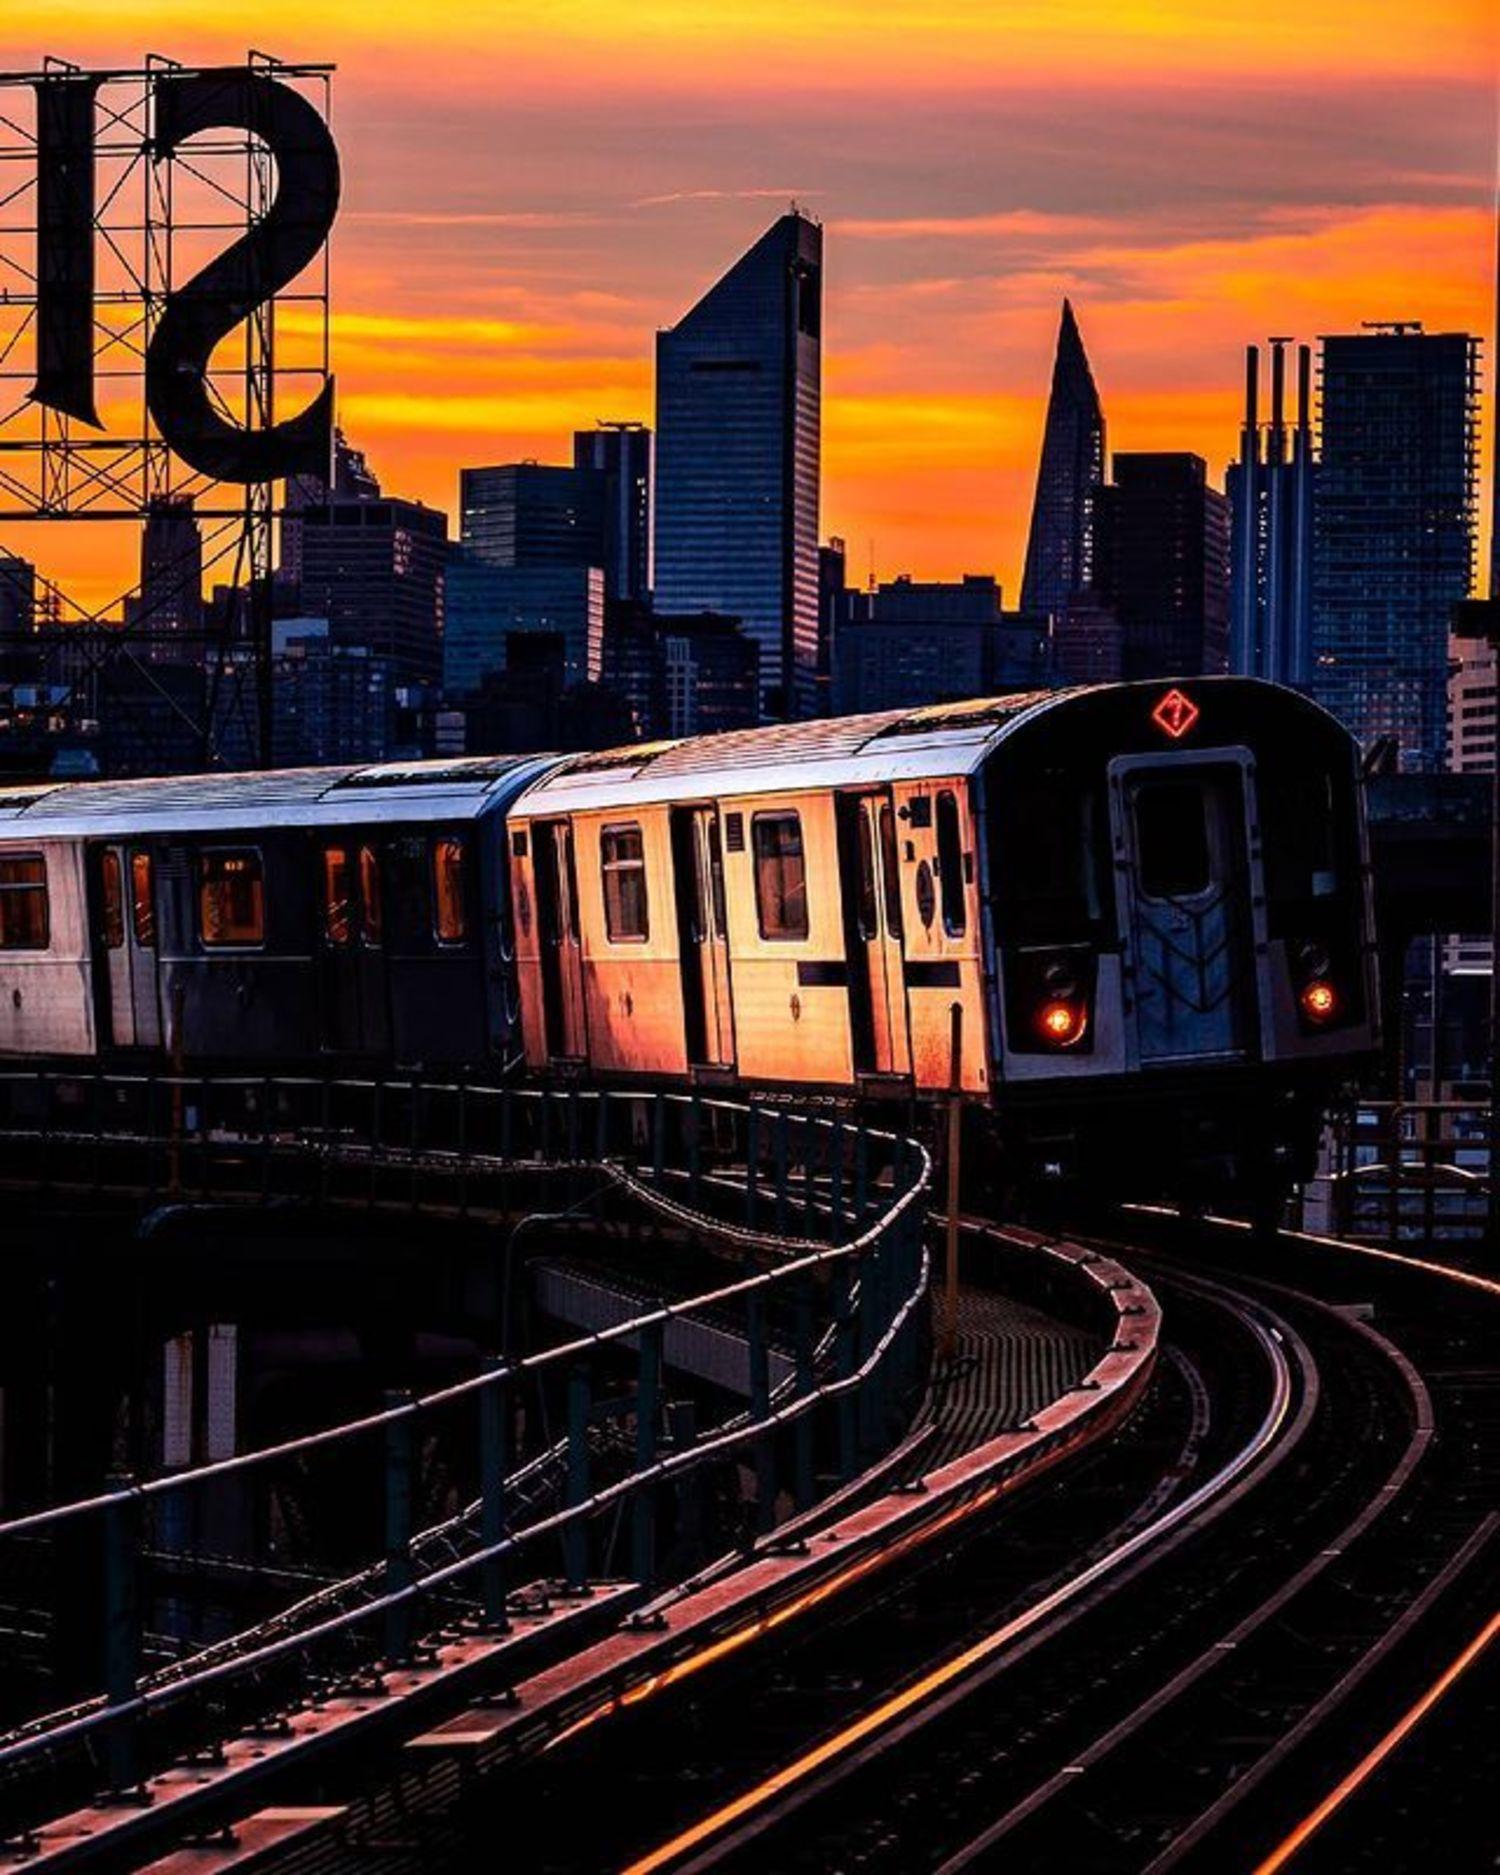 7 Train, Long Island City, Queens